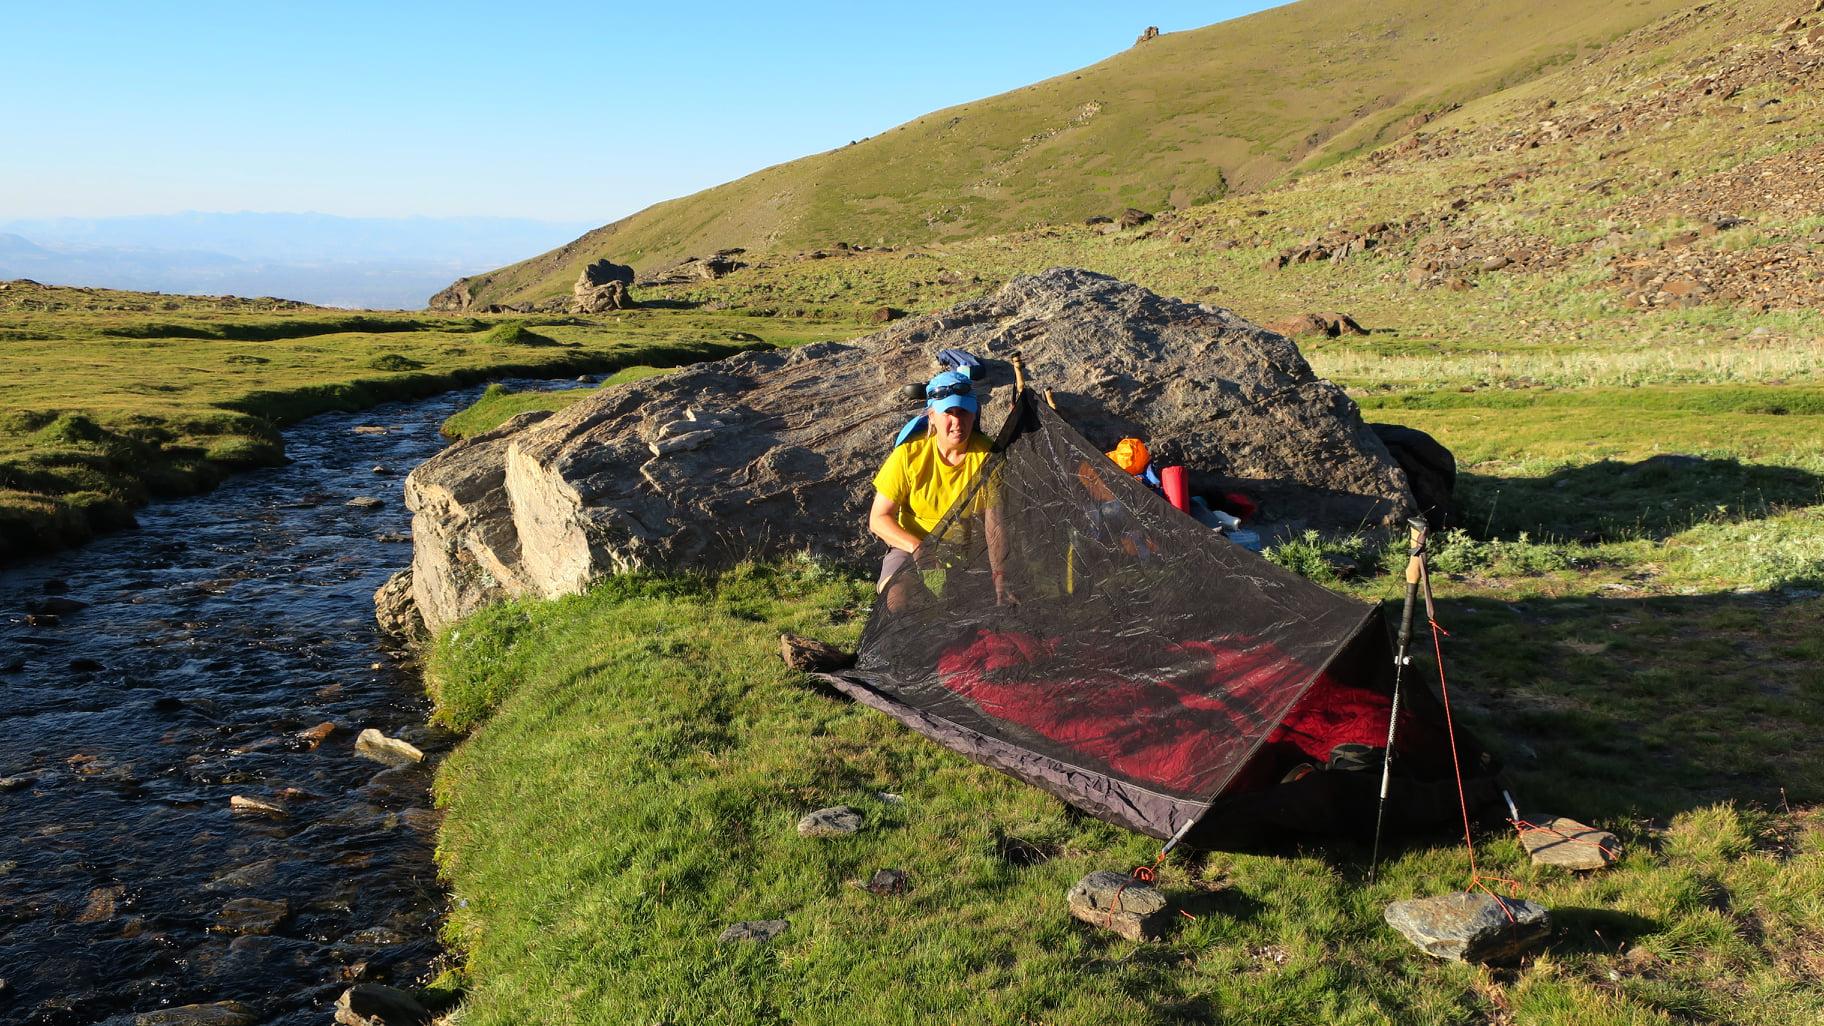 The campsite in Lavaderos de la Reina